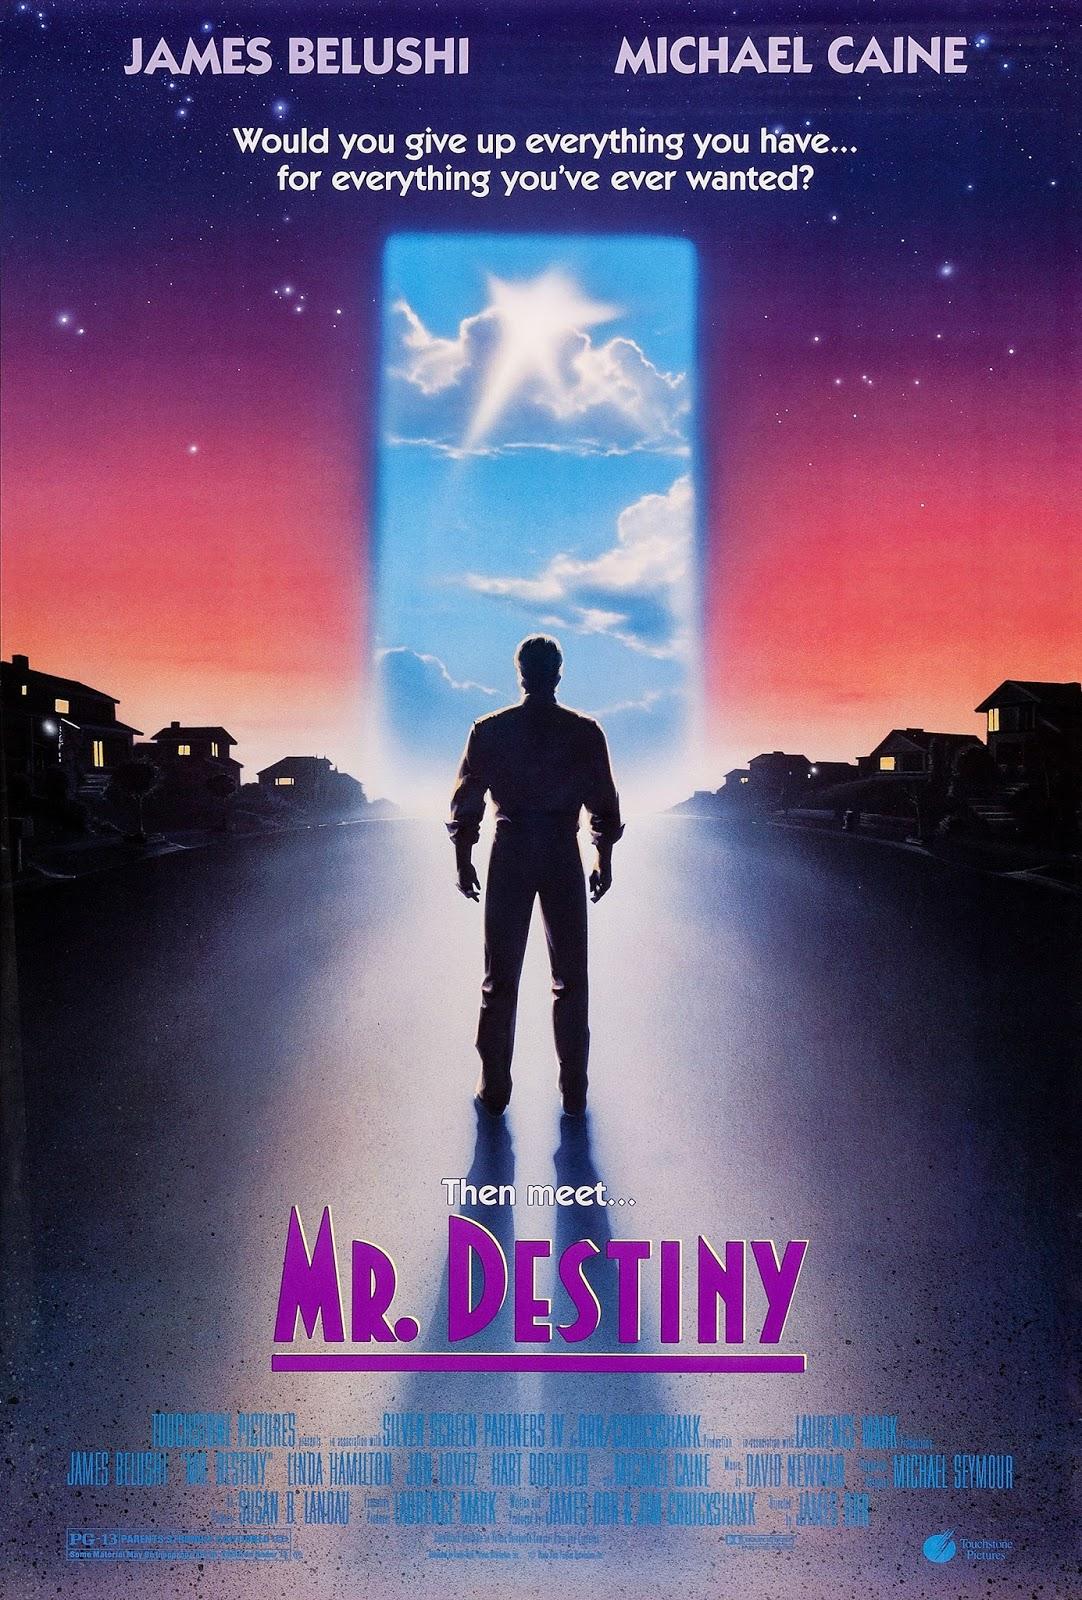 Mr destiny cast